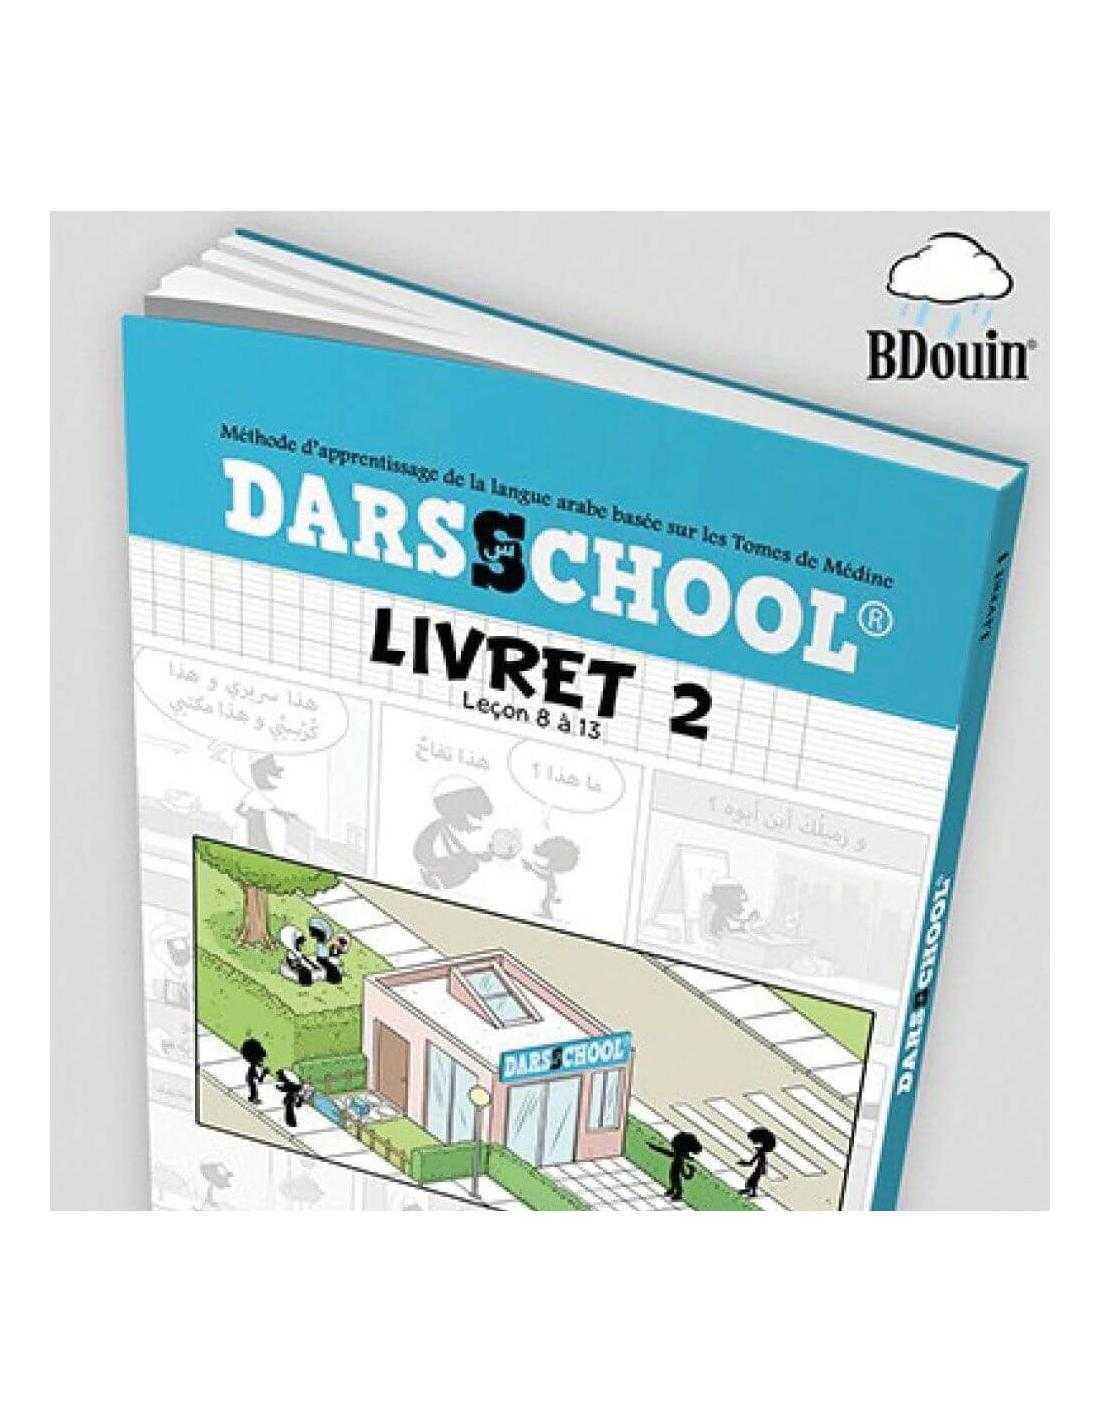 DARSSCHOOL tome de medine 2  - Livre 2